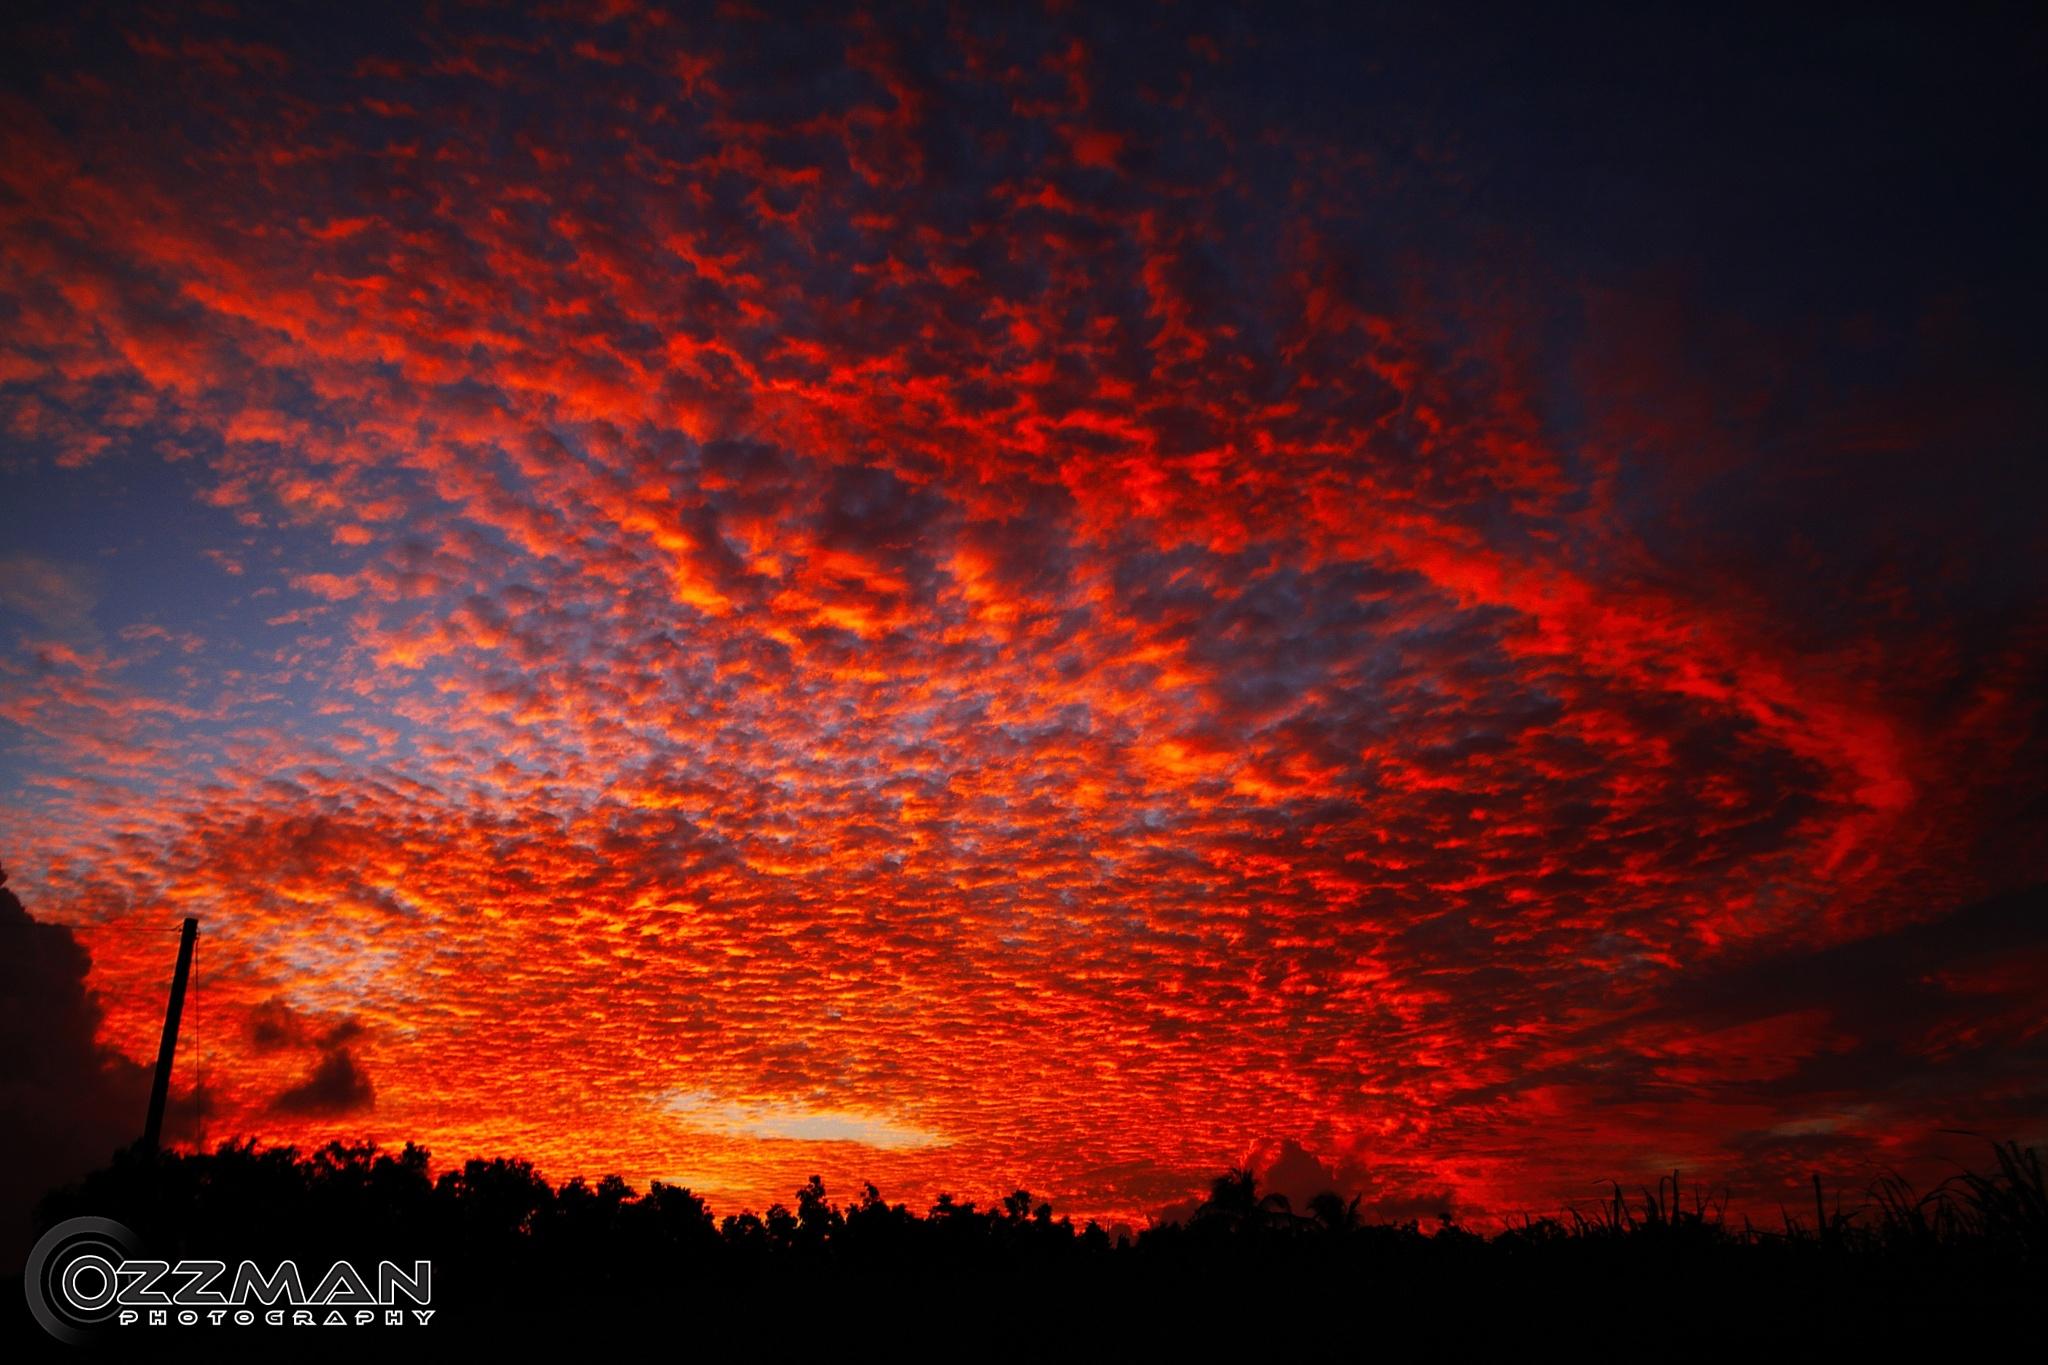 Red Sunset by Ozzy Osborne